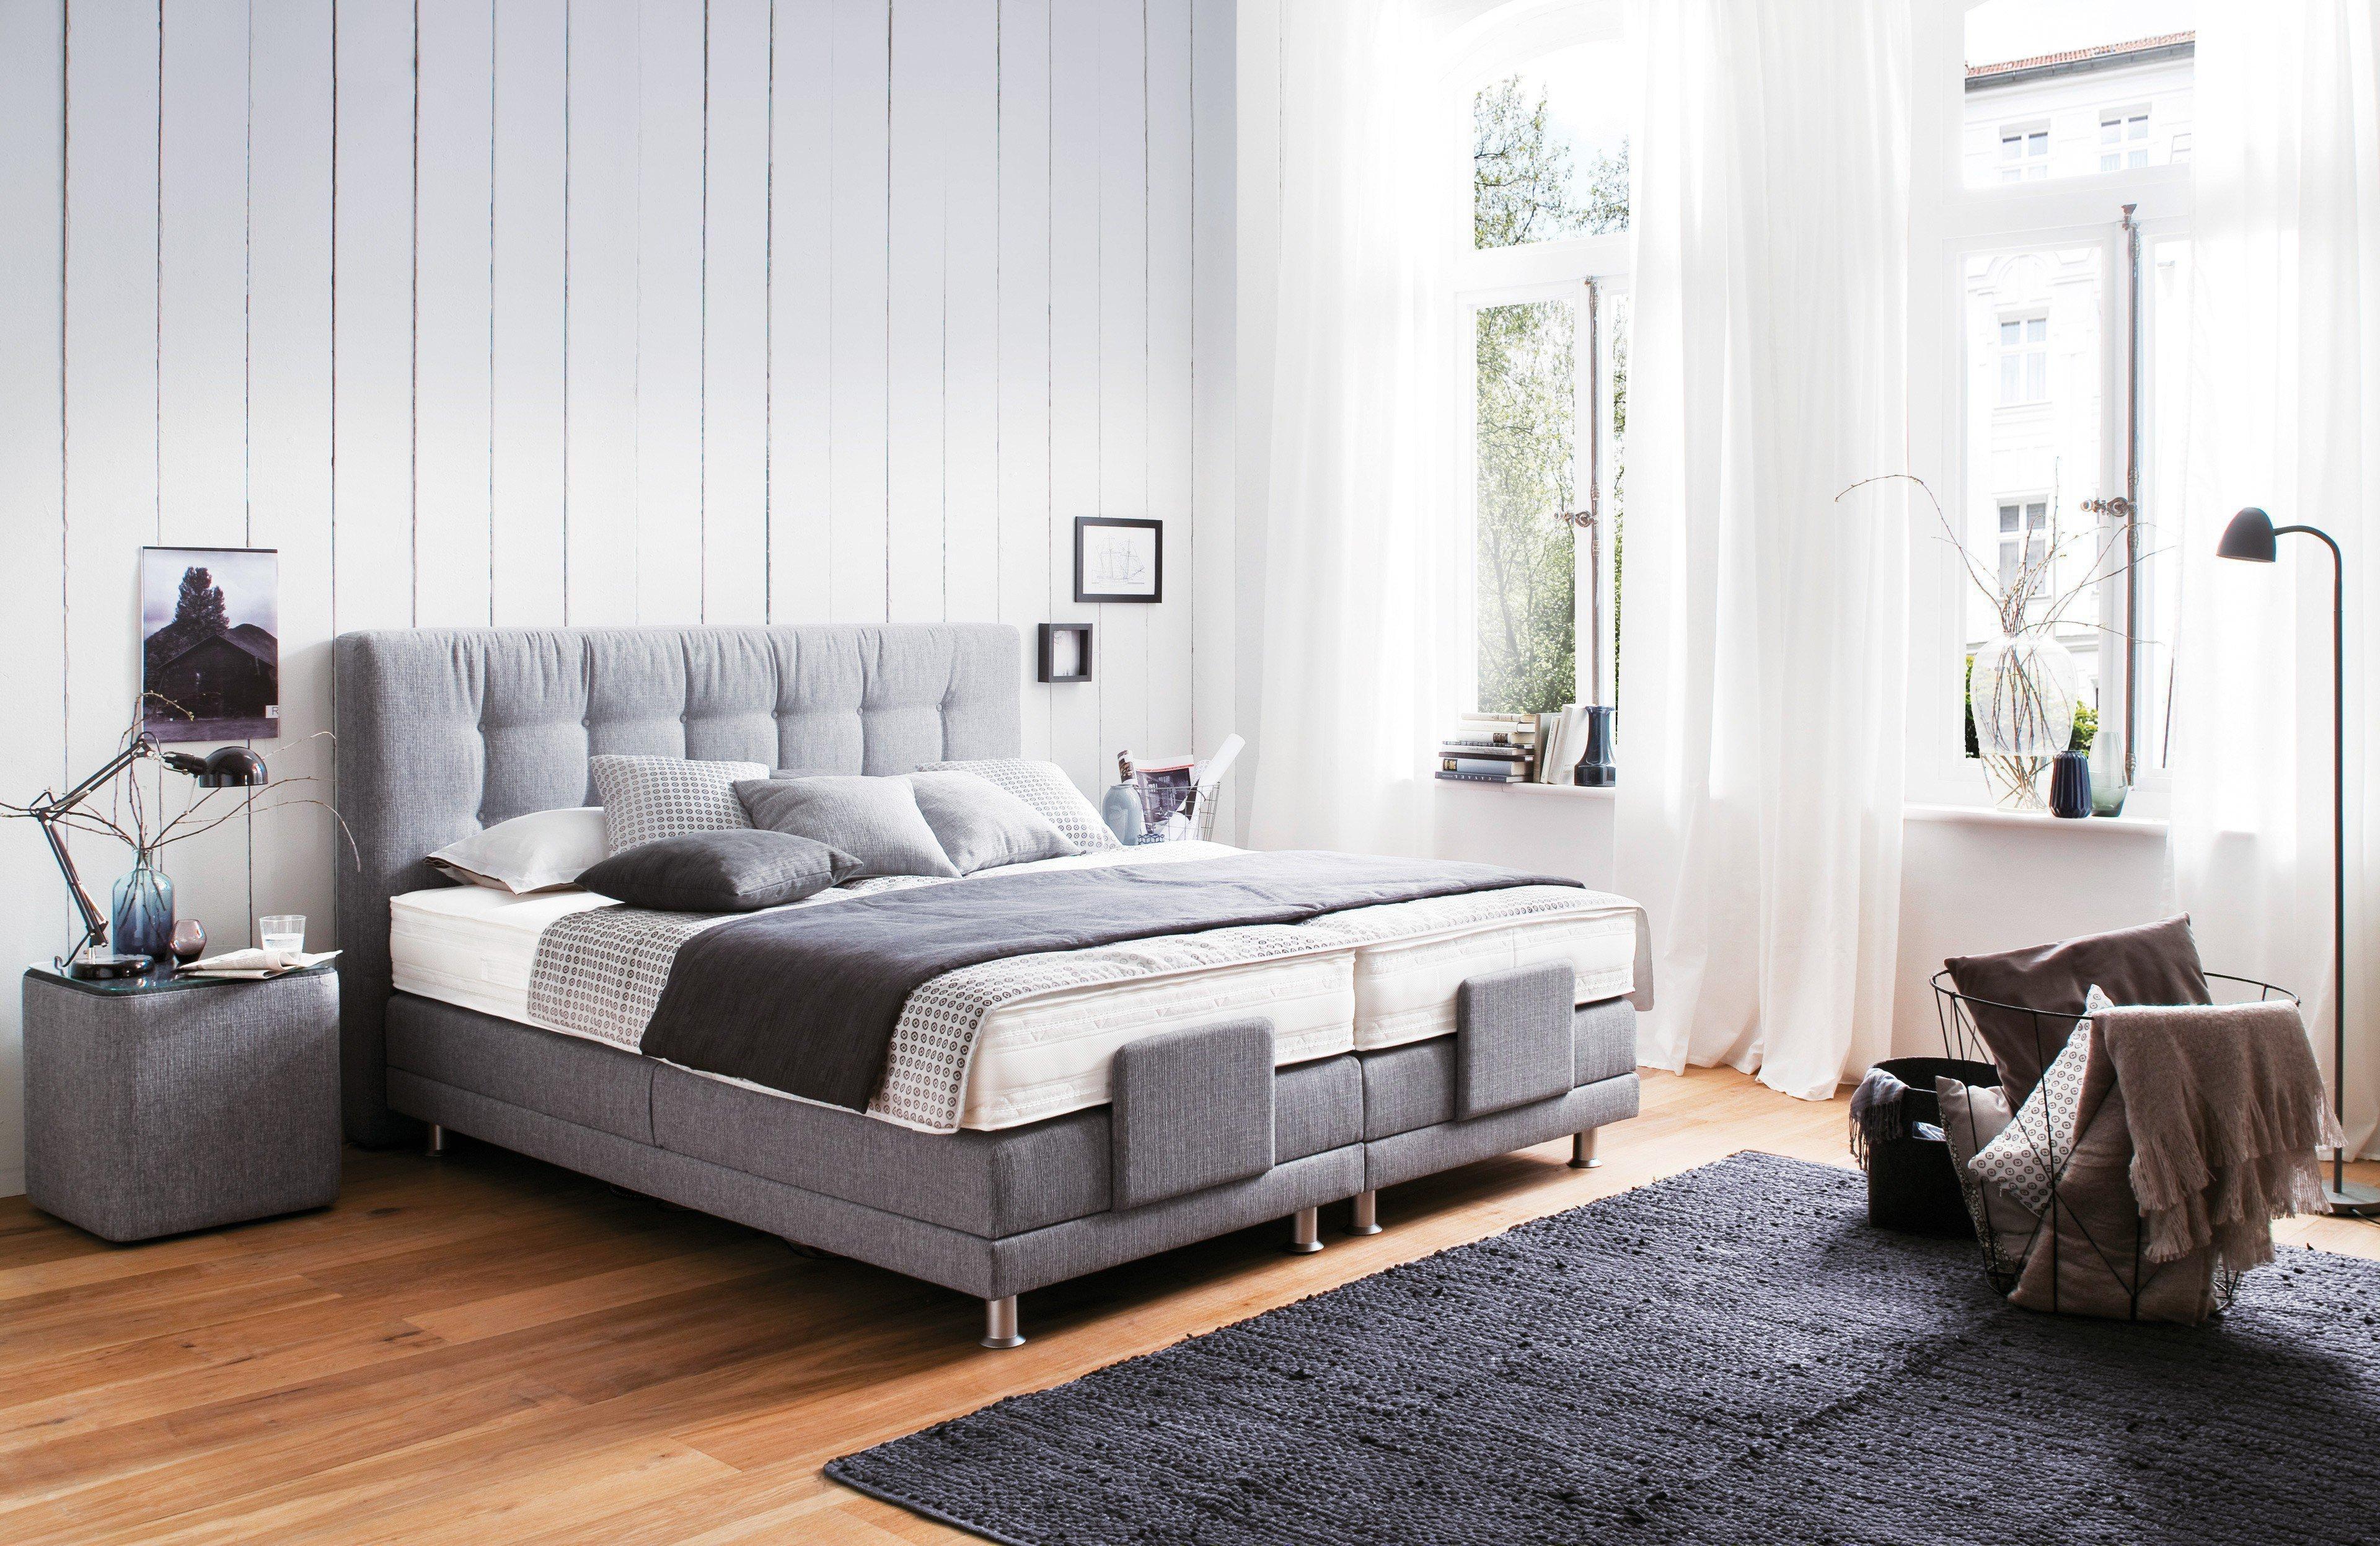 oschmann boxspringbett belcanto lyon mit motor in grau m bel letz ihr online shop. Black Bedroom Furniture Sets. Home Design Ideas